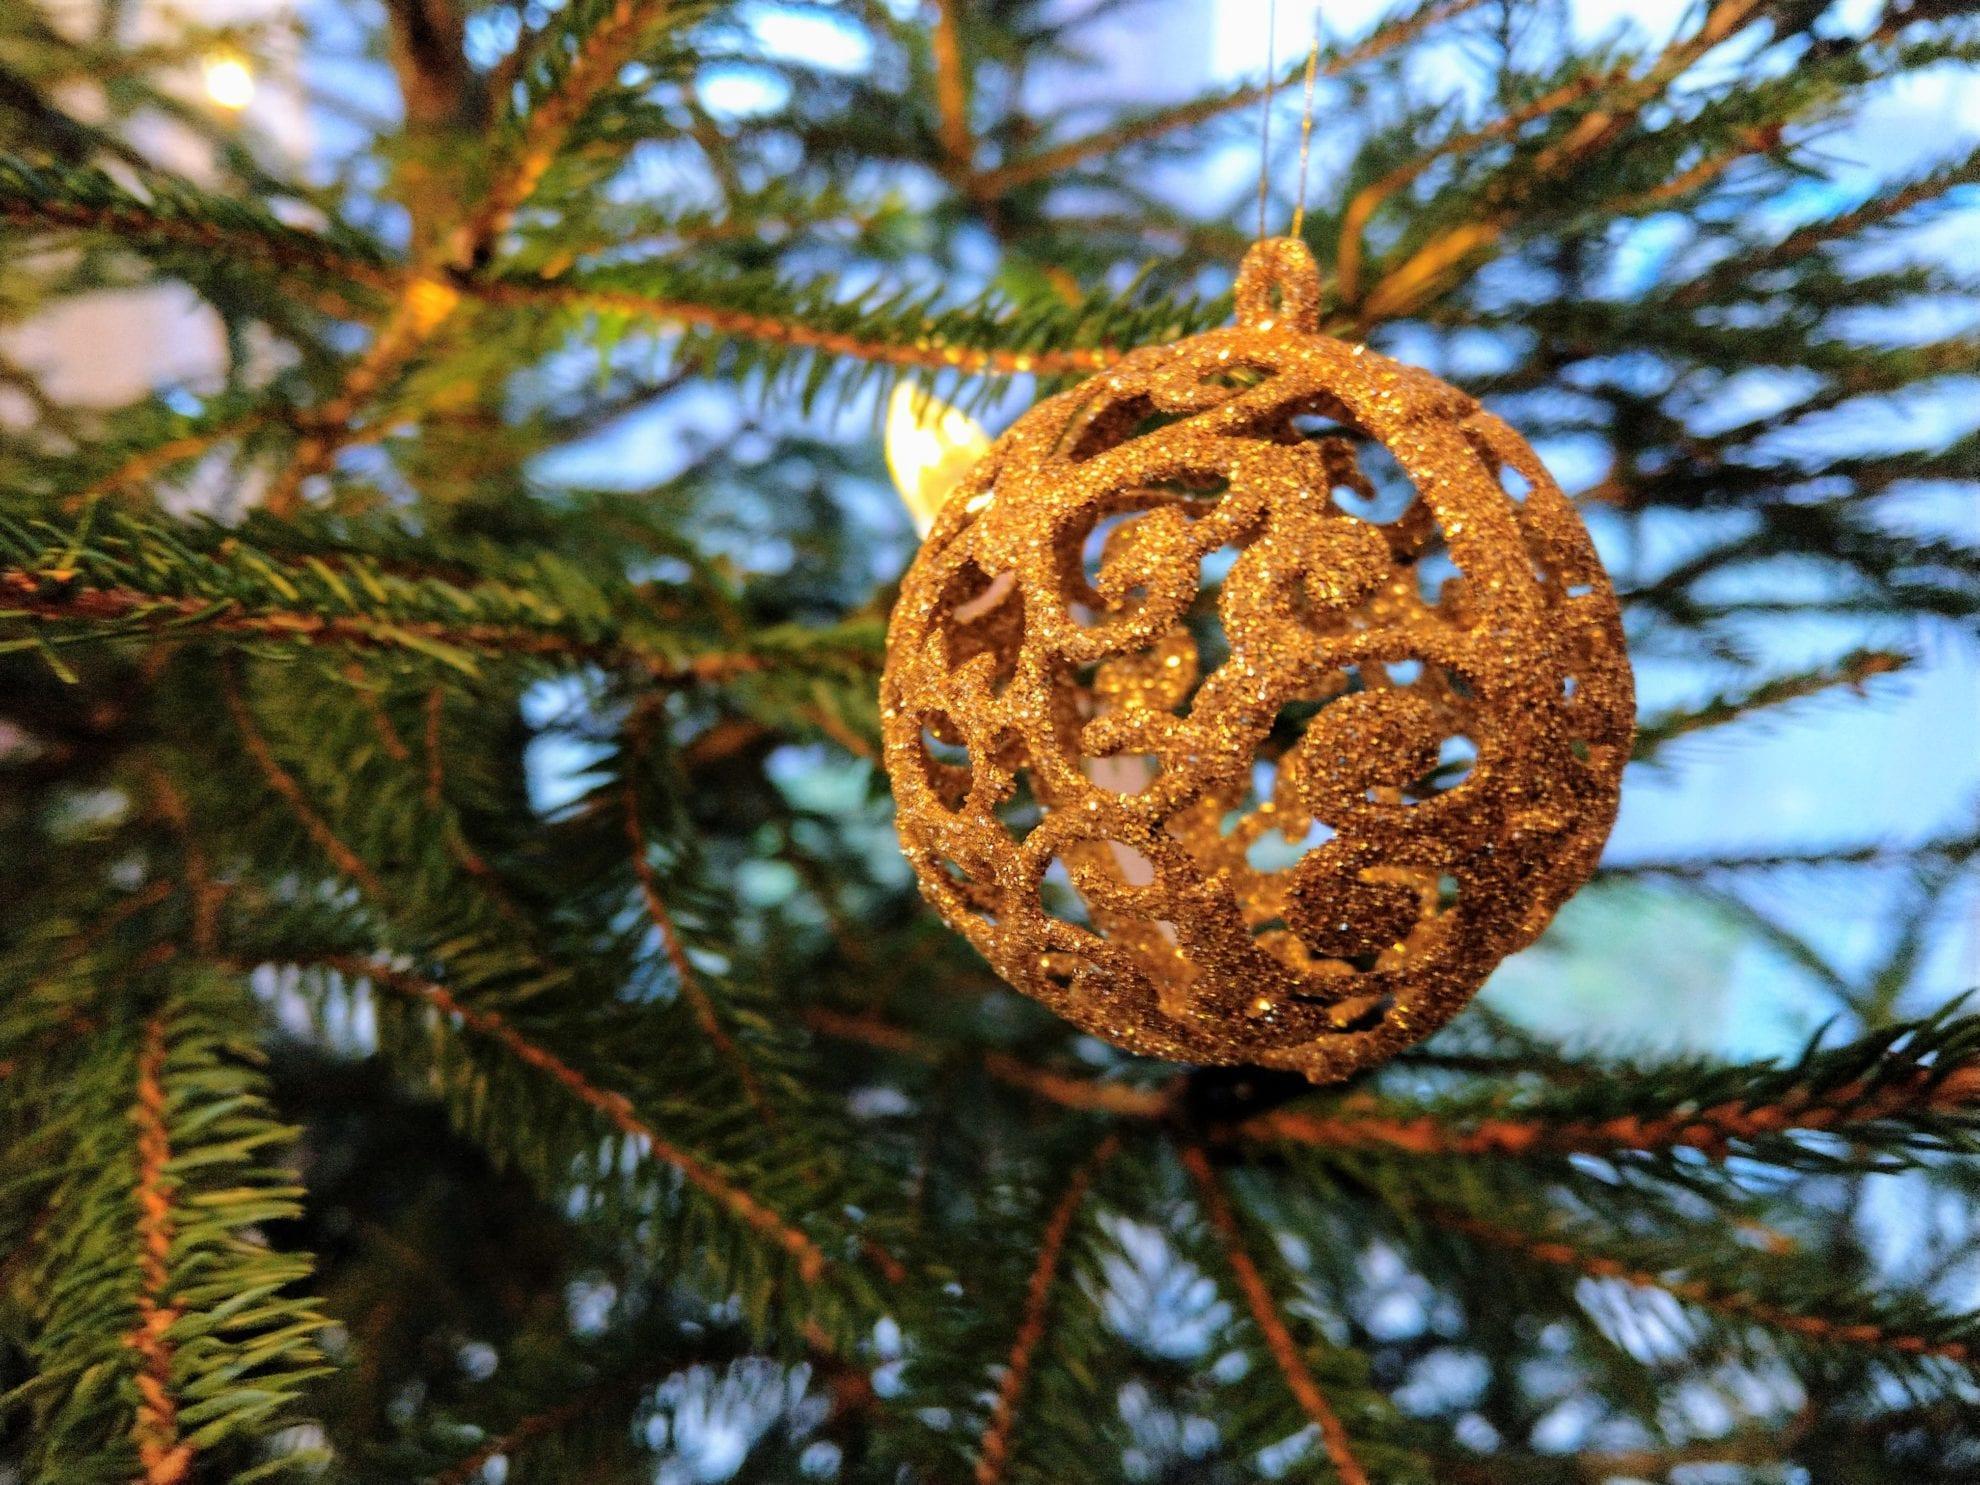 Weihnachtstradition, Tradition, Magen-Darm, Familienleben, Großfamilie, Familie, Mamablog, Puddingklecks